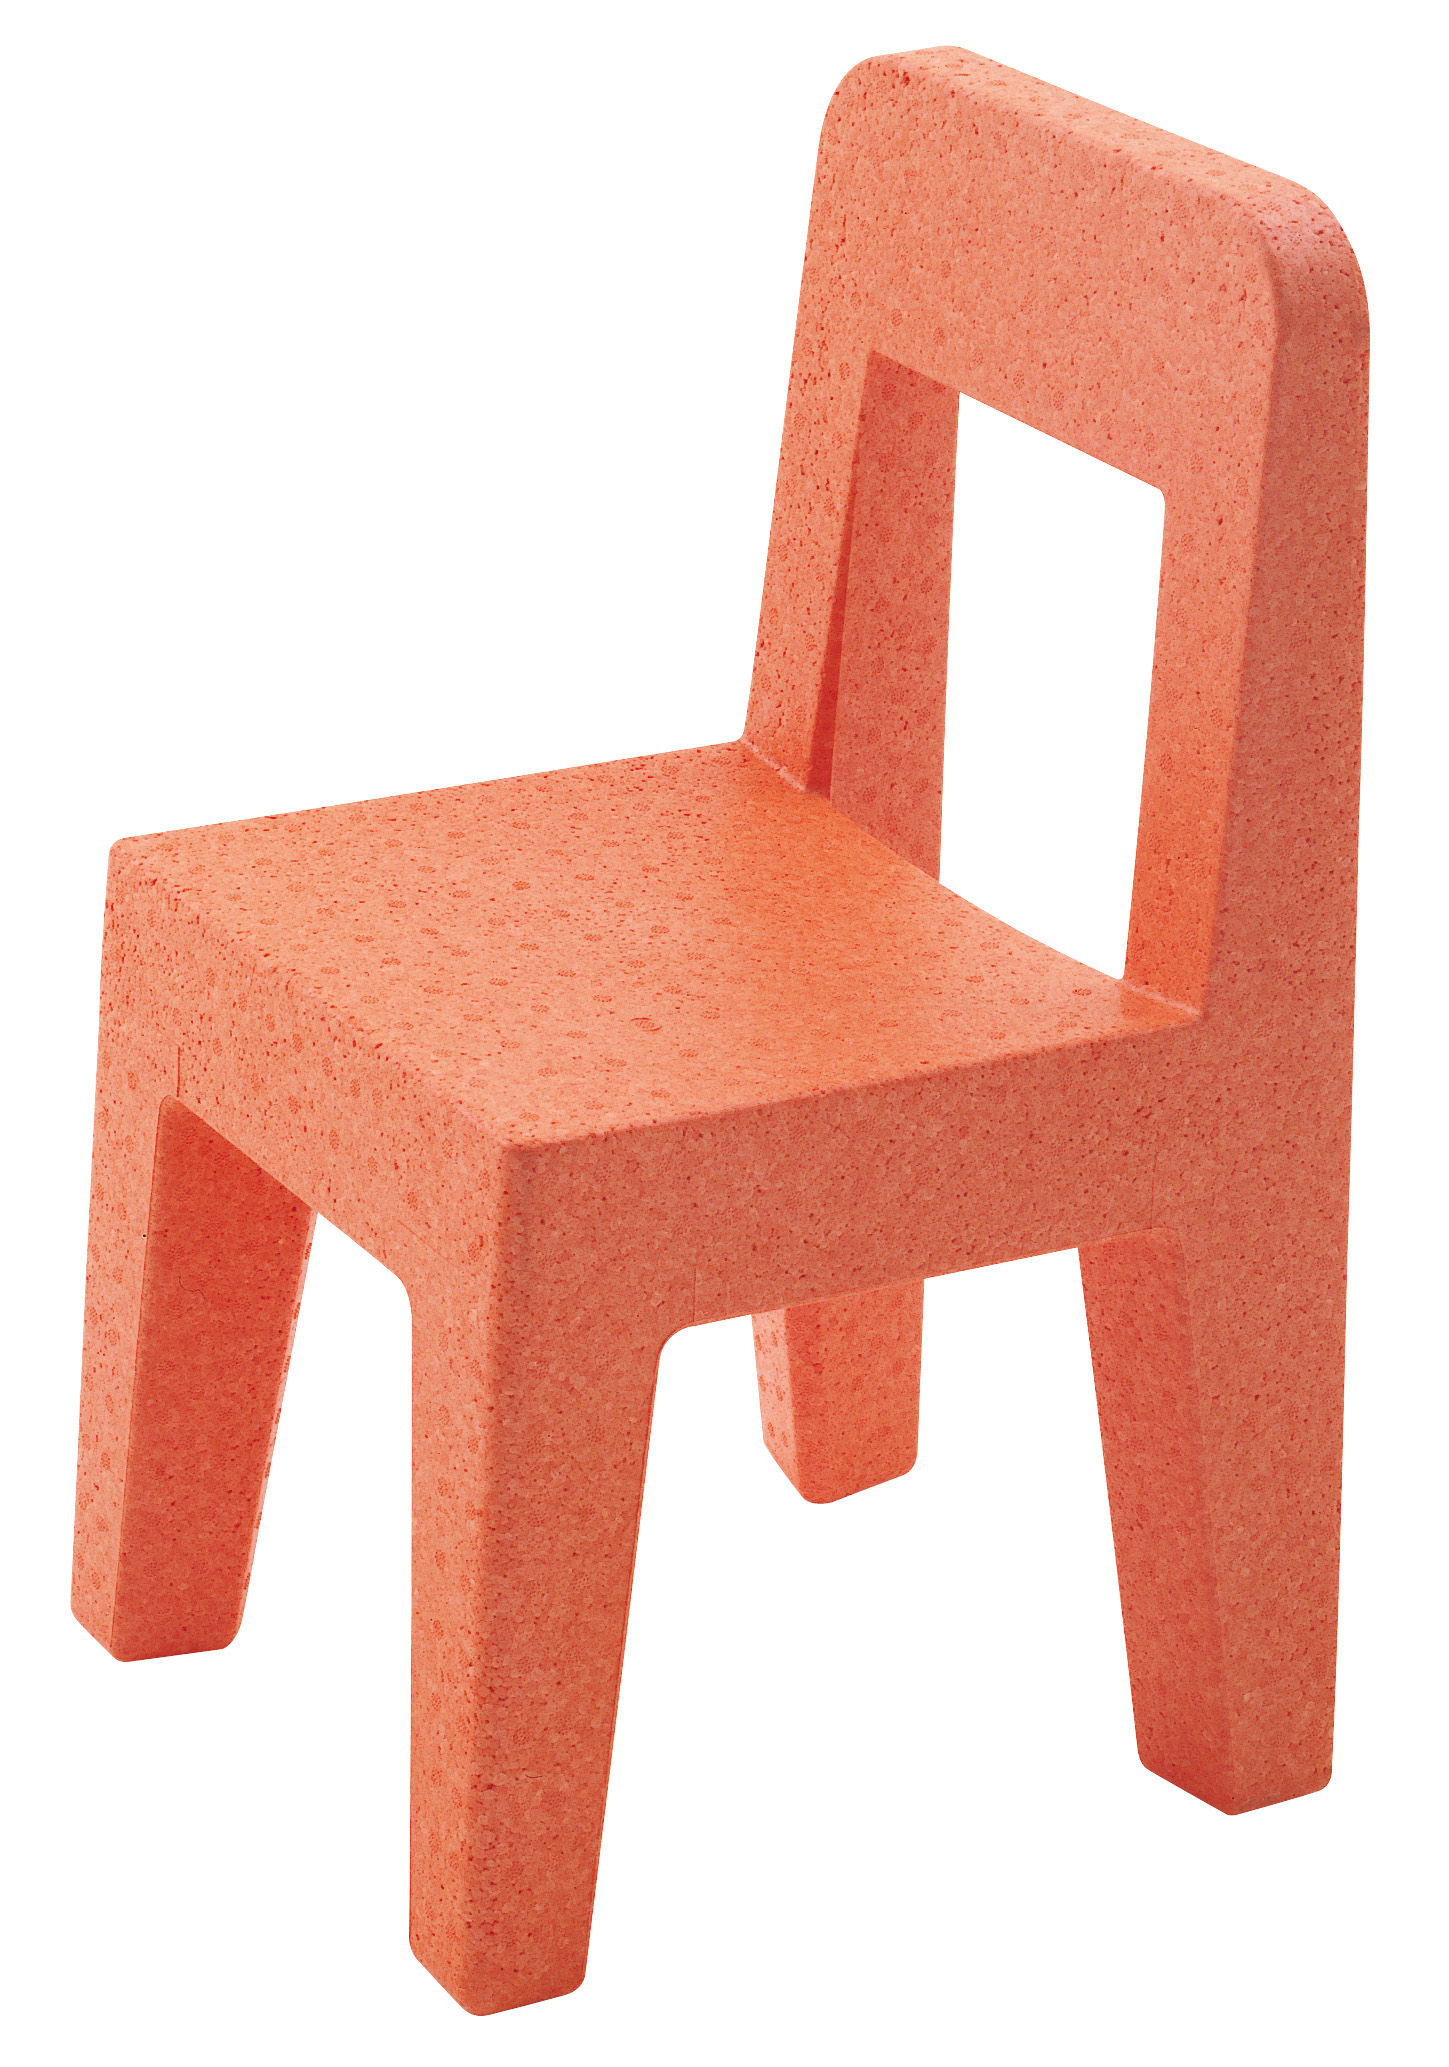 Mobilier - Mobilier Kids - Chaise enfant Seggiolina Pop - Magis Collection Me Too - Orange - Polypropylène